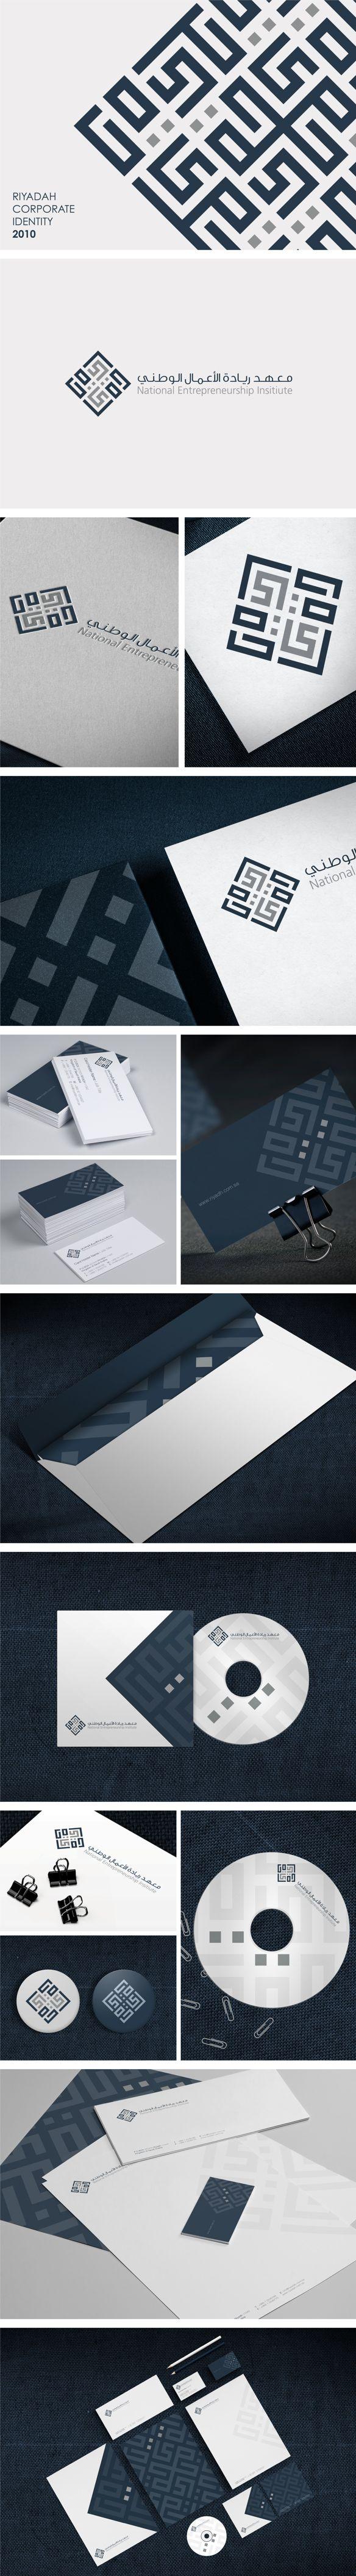 Riyadah Identity // Branding by Mohd Almousa, via Behance - love the geometric lettering of the logo.